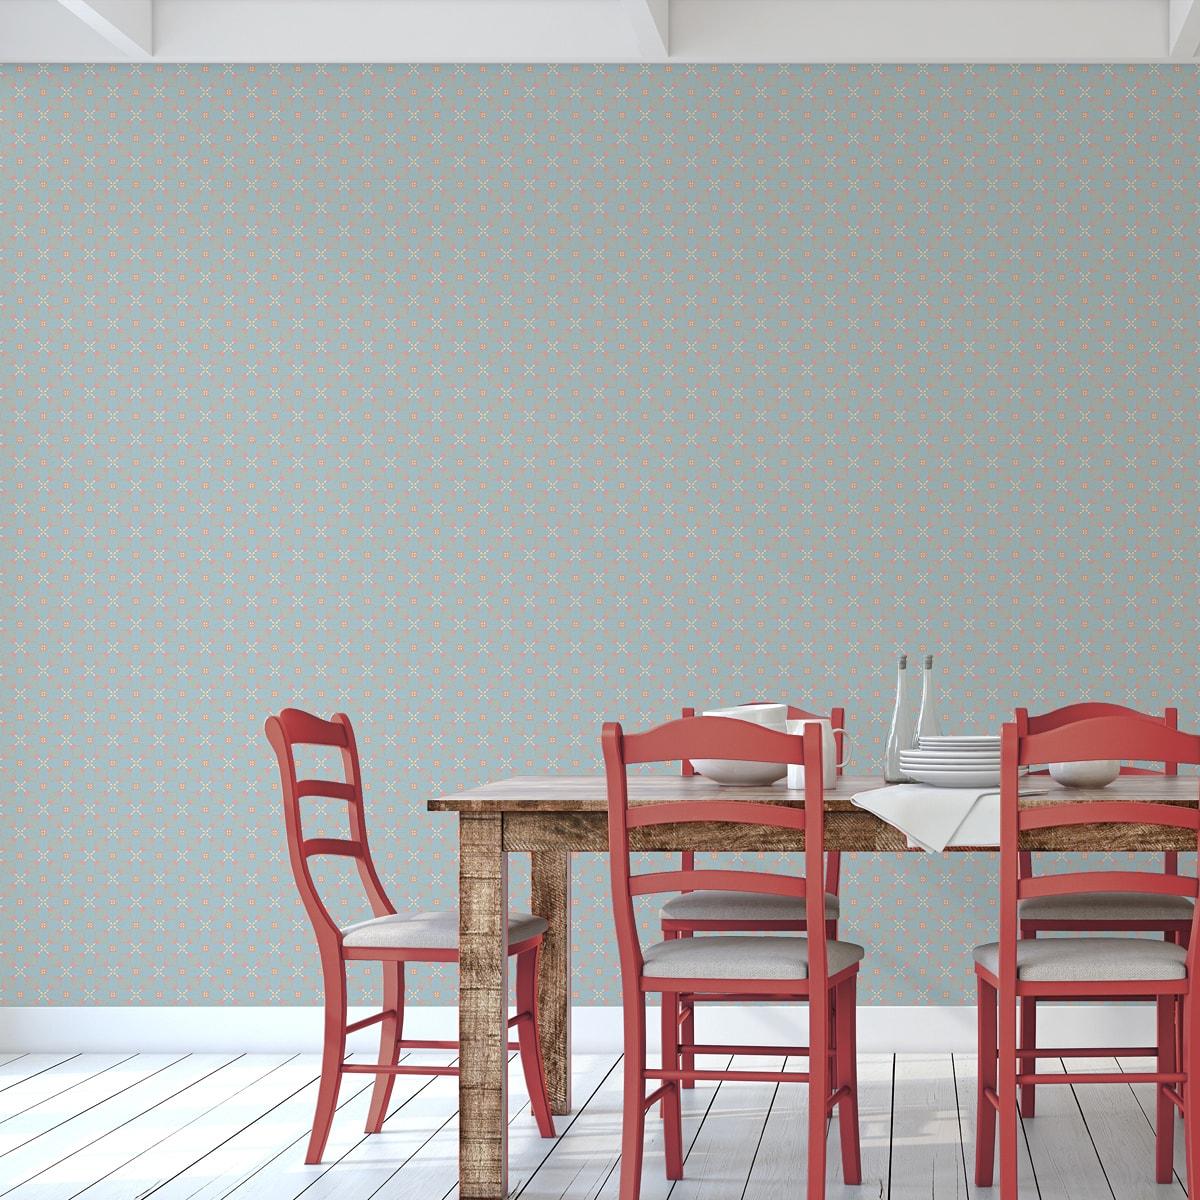 Hellblaue Ornamenttapete Art Deko Lilly Retro Muster, Design Tapete als Wandgestaltung 2